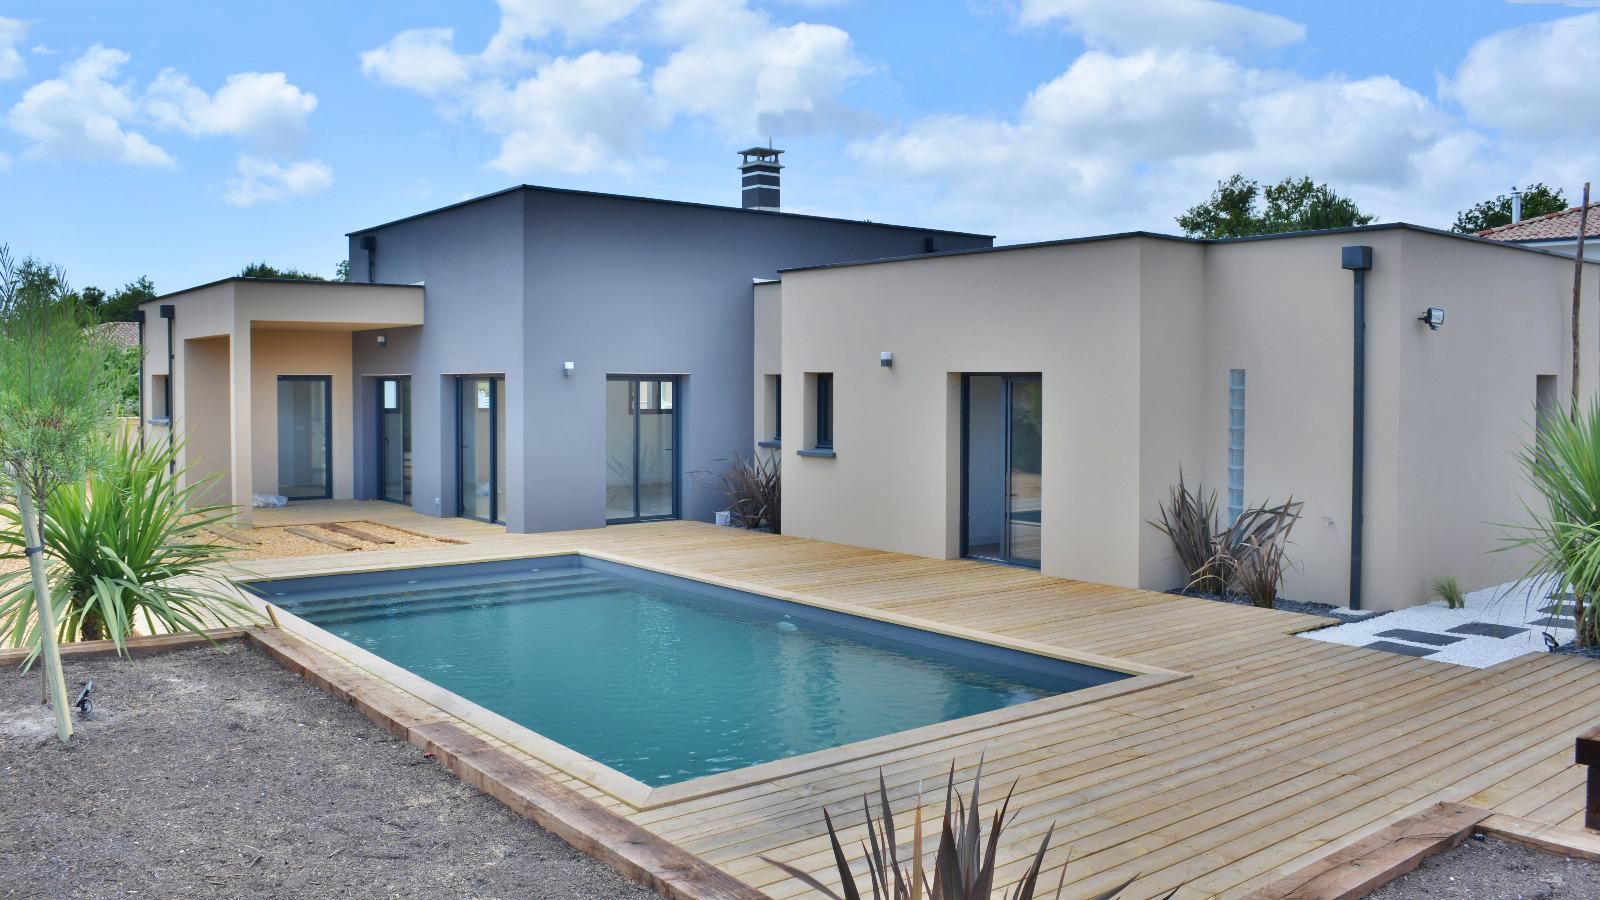 Ar s belle villa moderne proche for t et commerces immo prestige for Belles villas modernes